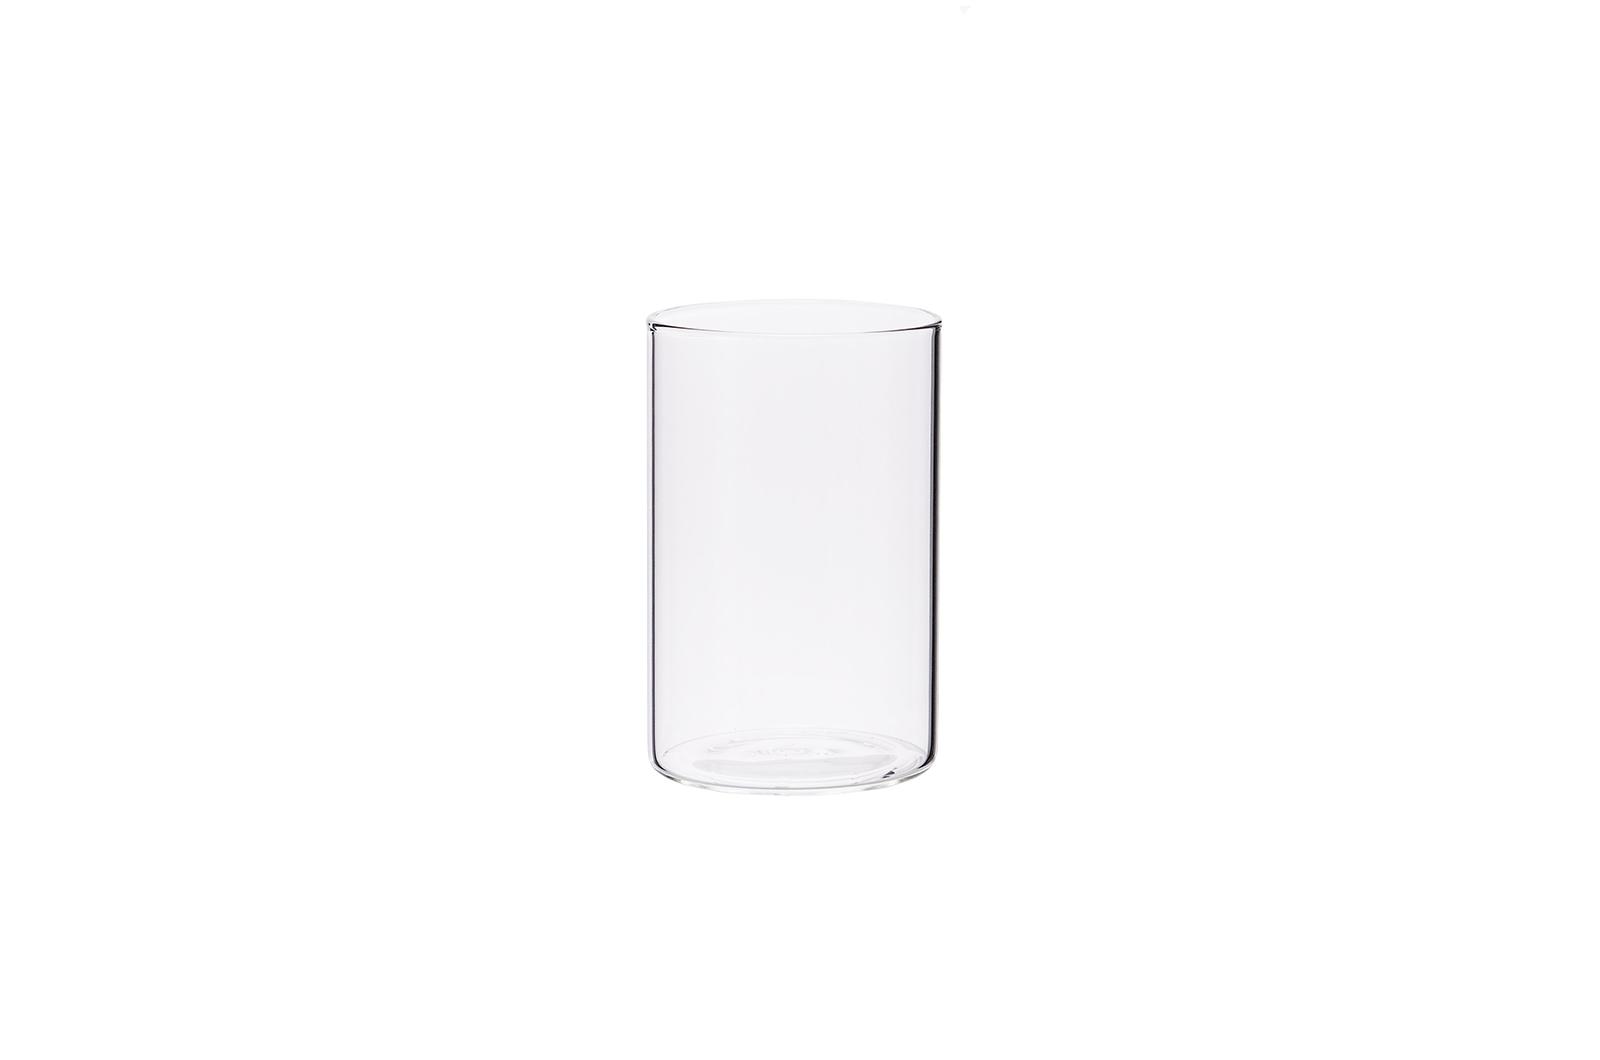 BOROSIL VISION GLASS M